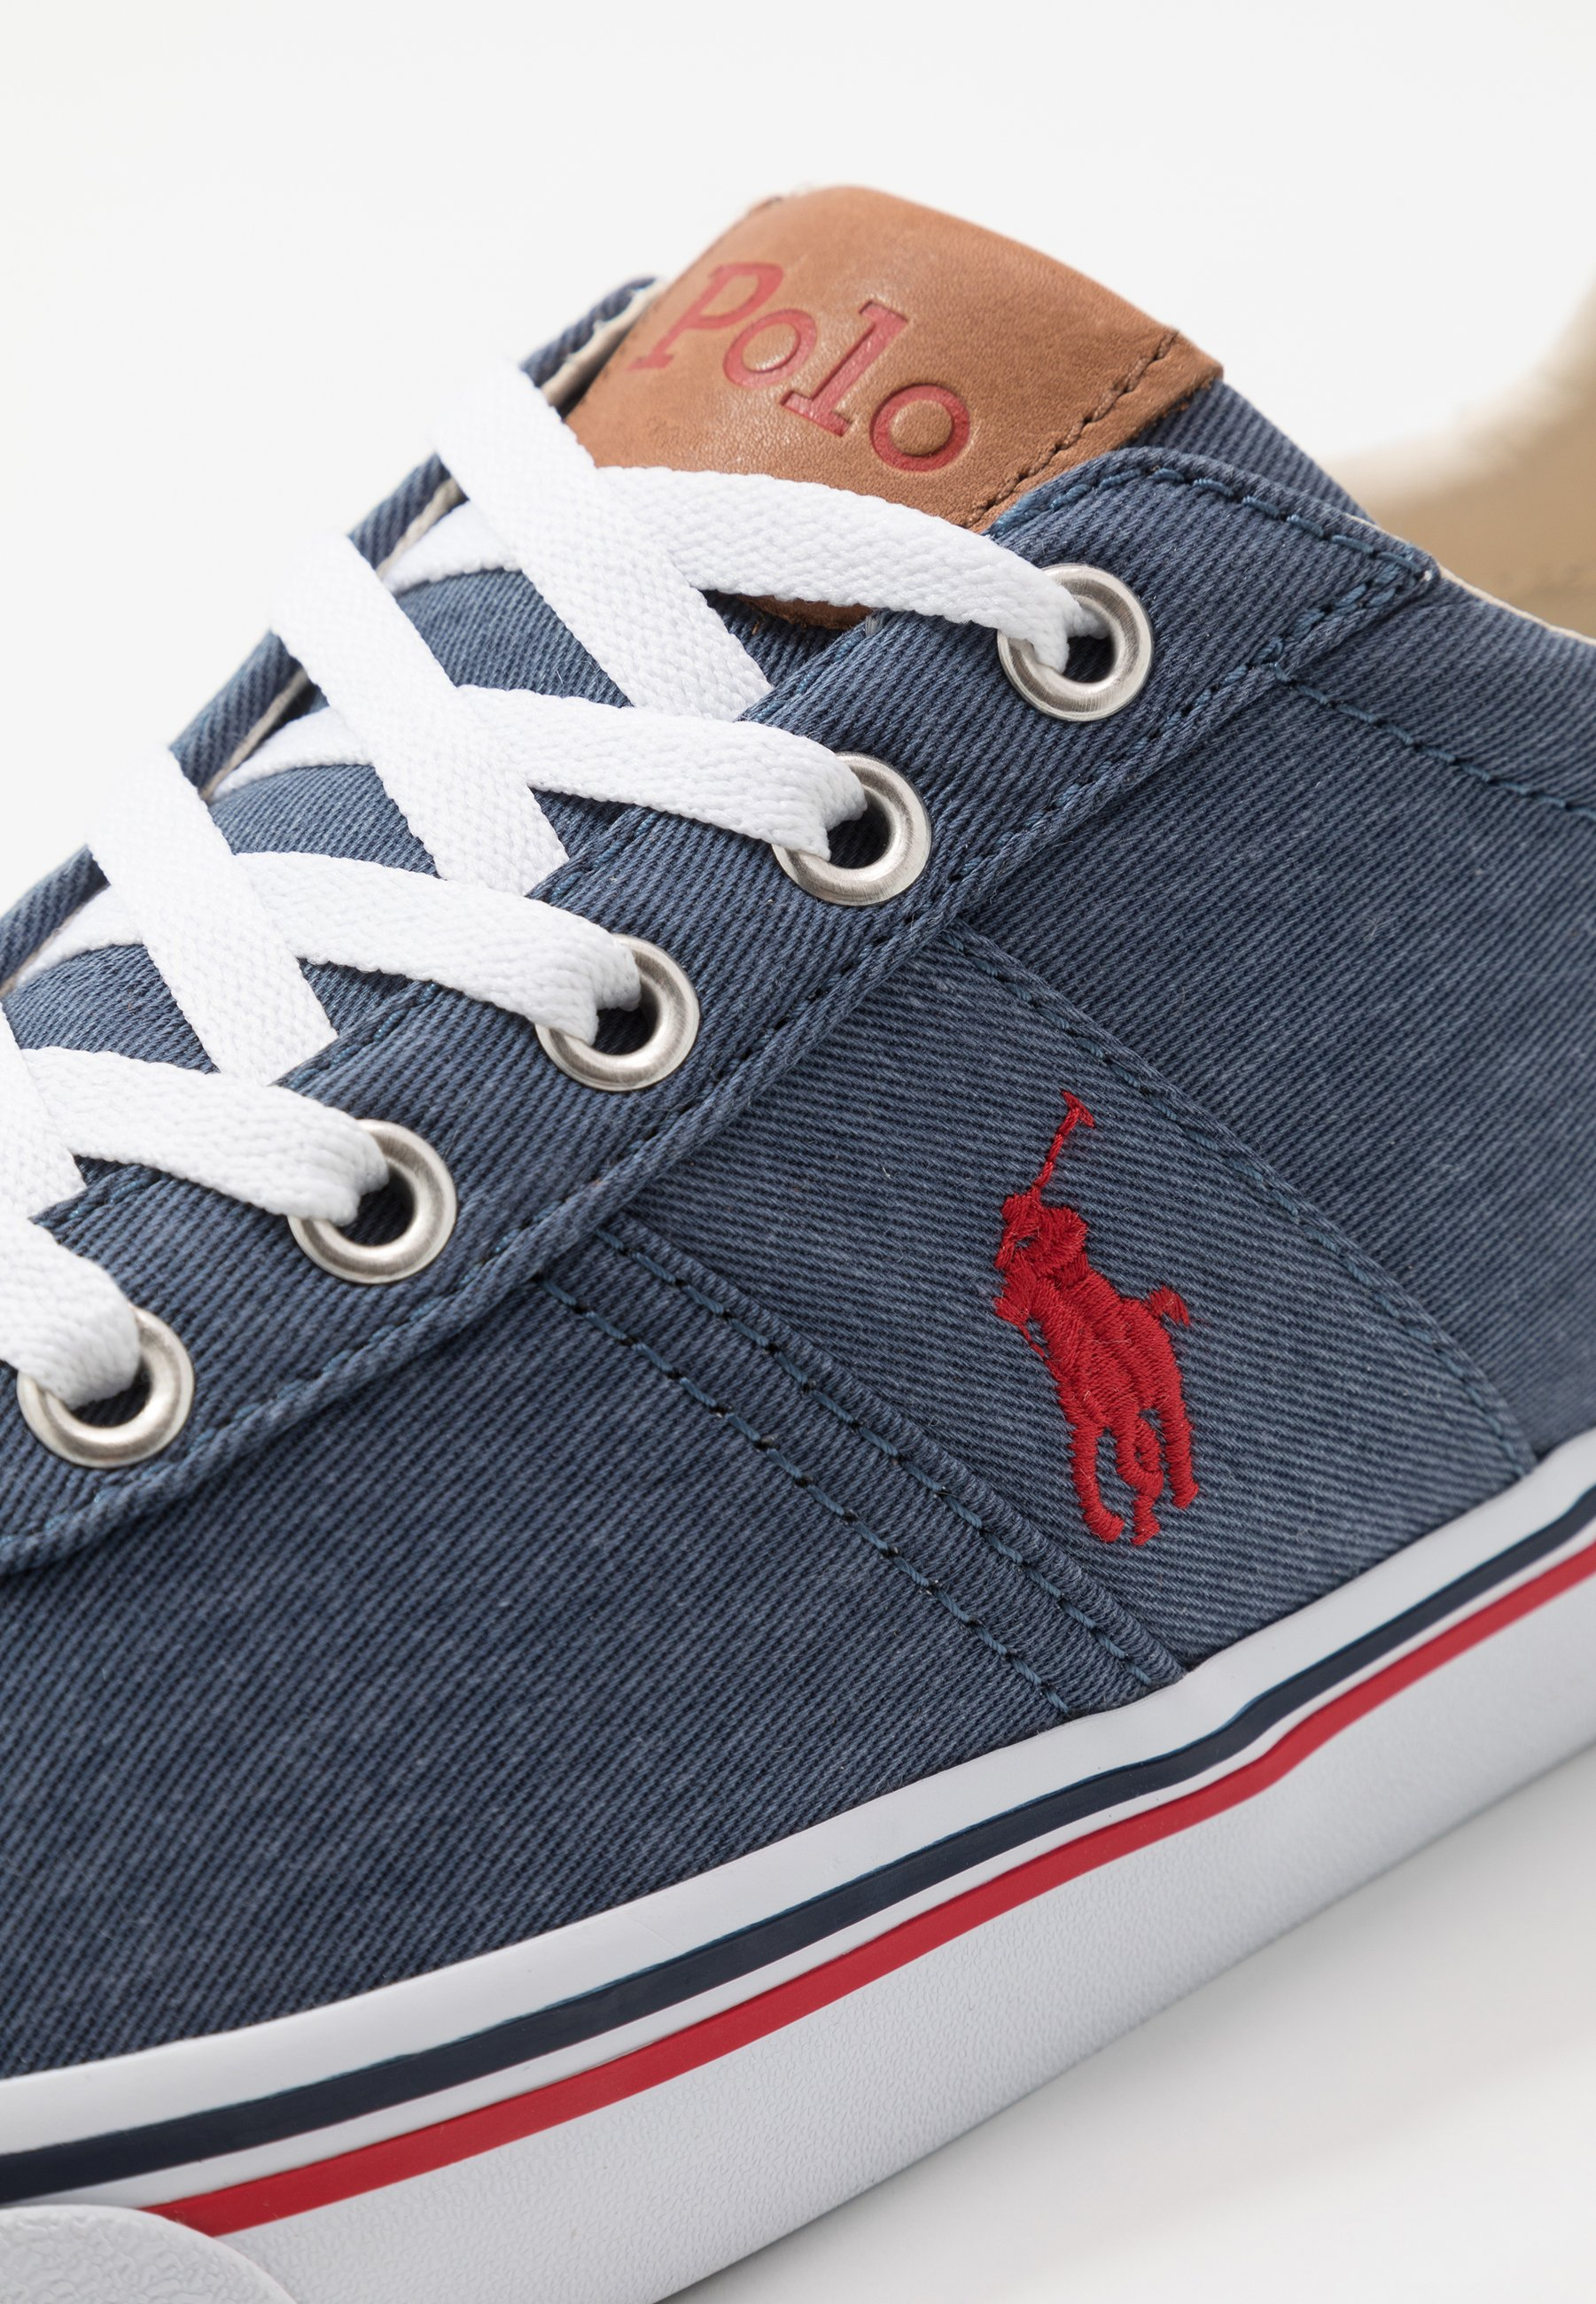 Polo Ralph Lauren Hanford - Baskets Basses Newport Navy/red